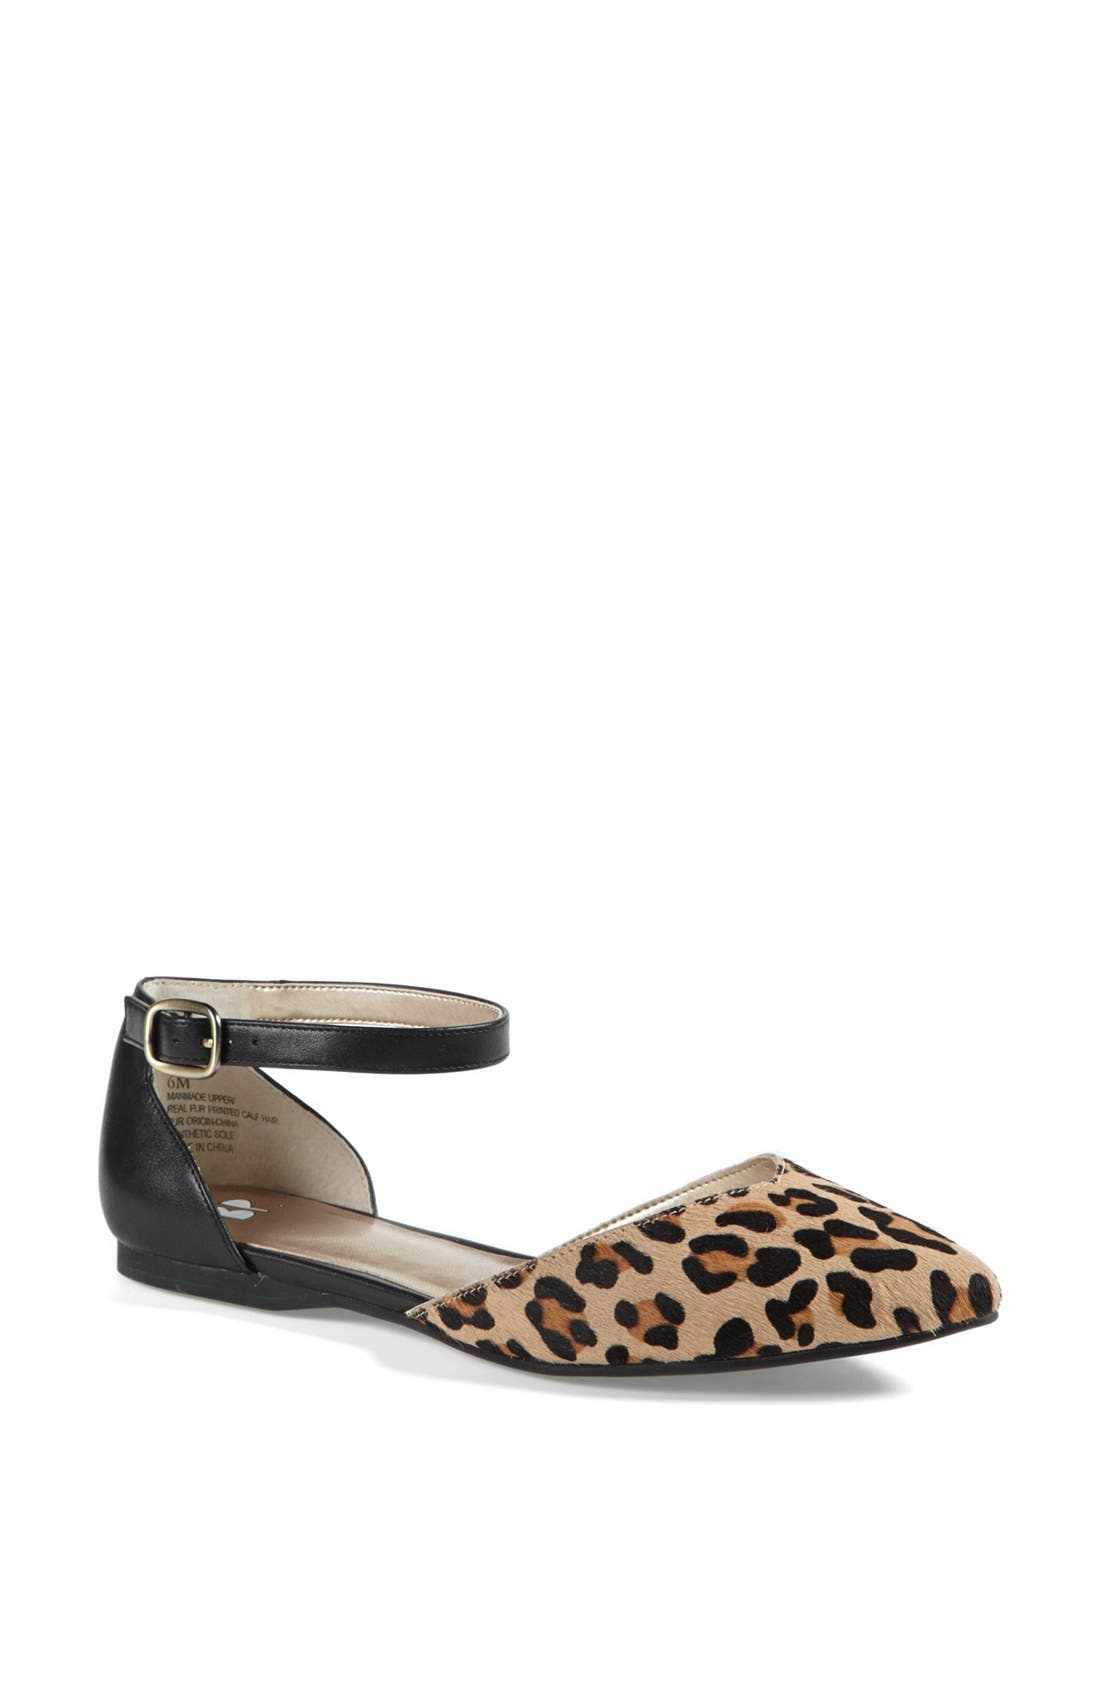 Alternate Image 1 Selected - BP. 'Gillie' Ankle Strap Flat